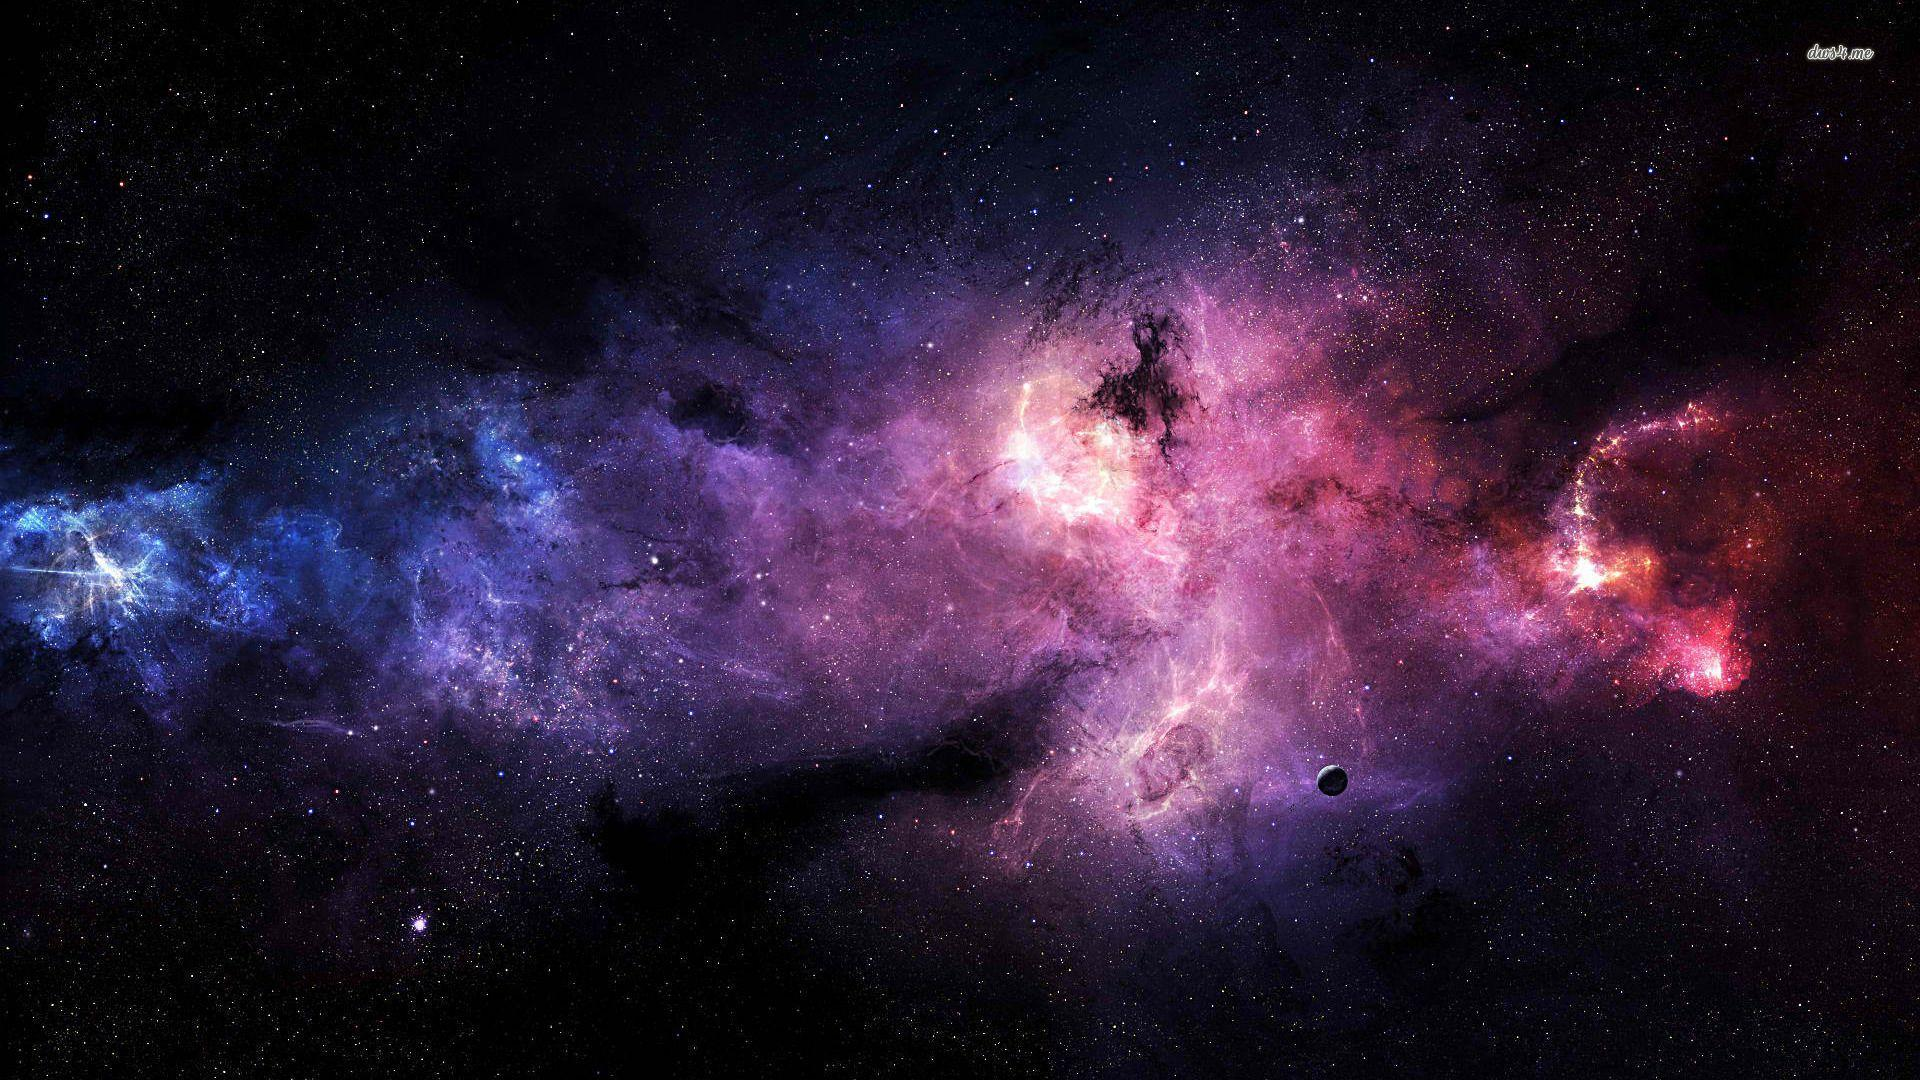 Galaxy Desktop Backgrounds Wallpaper Cave